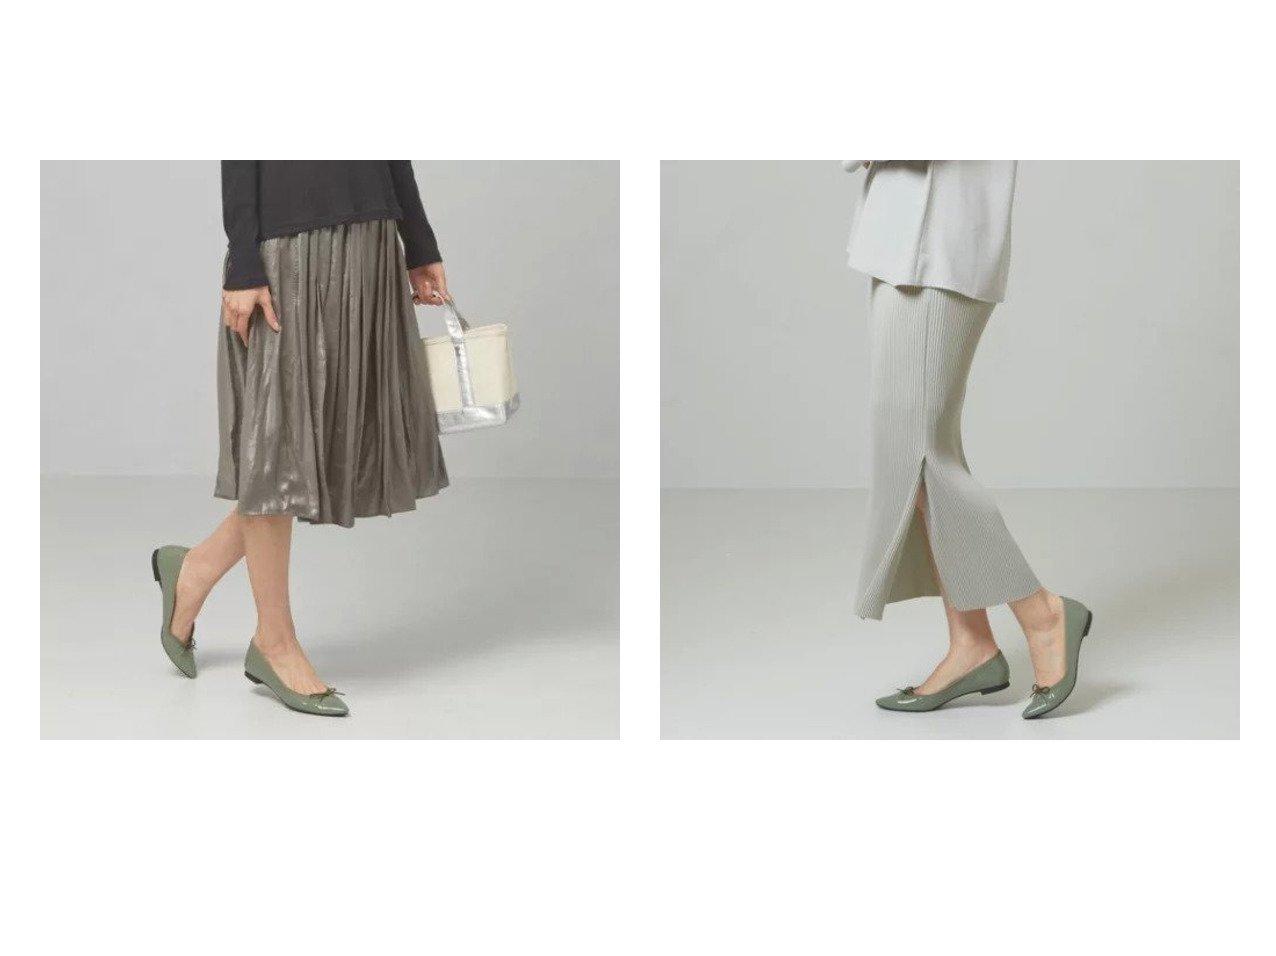 【THE STATION STORE / UNITED ARROWS/ザ ステーション ストア】のシャイニーサテン ギャザー スカート -手洗い可能-&プリーツ マキシ タイトスカート -手洗い可能- 【スカート】おすすめ!人気、トレンド・レディースファッションの通販 おすすめで人気の流行・トレンド、ファッションの通販商品 メンズファッション・キッズファッション・インテリア・家具・レディースファッション・服の通販 founy(ファニー) https://founy.com/ ファッション Fashion レディースファッション WOMEN スカート Skirt エアリー エレガント ギャザー 今季 サテン シューズ バランス フラット 春 Spring スウェット スリット セットアップ タイトスカート パーカー フィット プリーツ マキシ ロング 楽ちん |ID:crp329100000031415